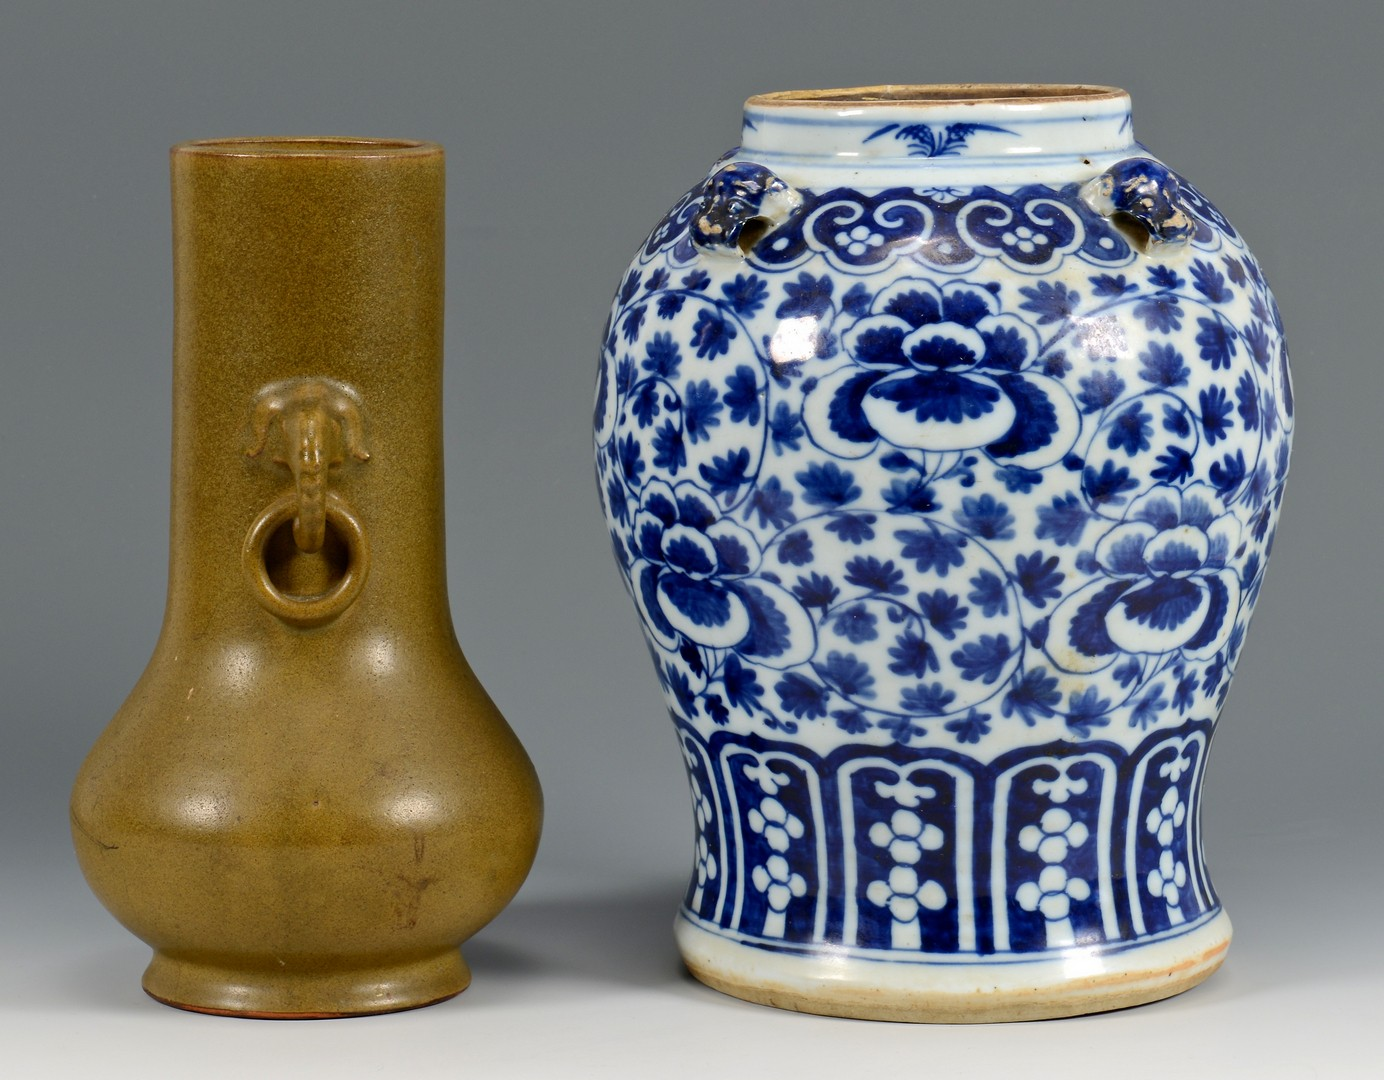 Lot 720: 2 Chinese Porcelain Vases